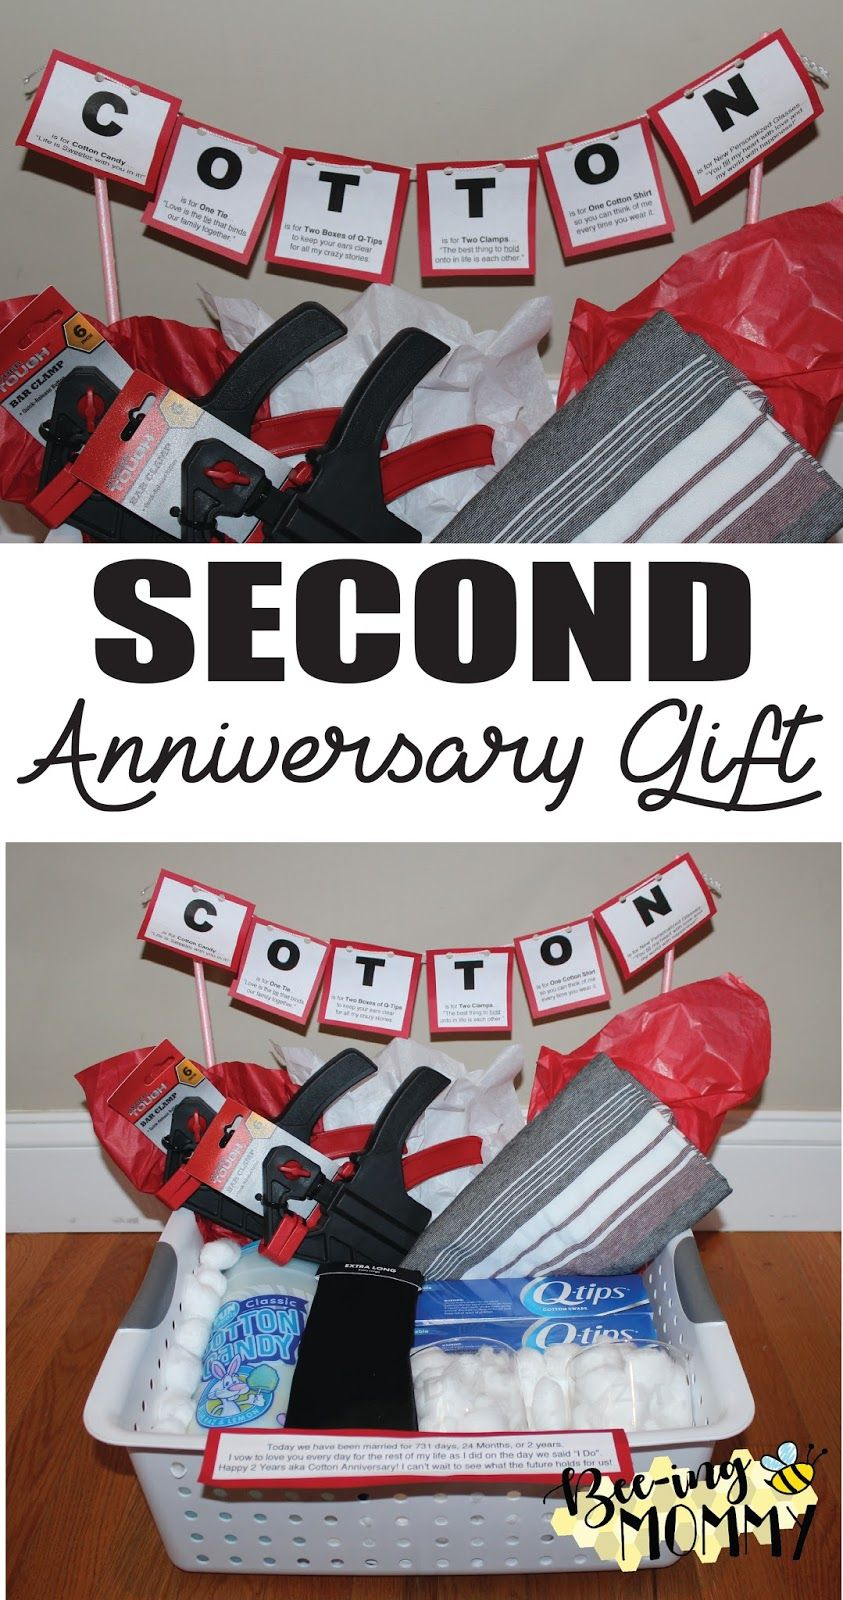 Cotton Anniversary Gift Basket Plus Several More Ideas